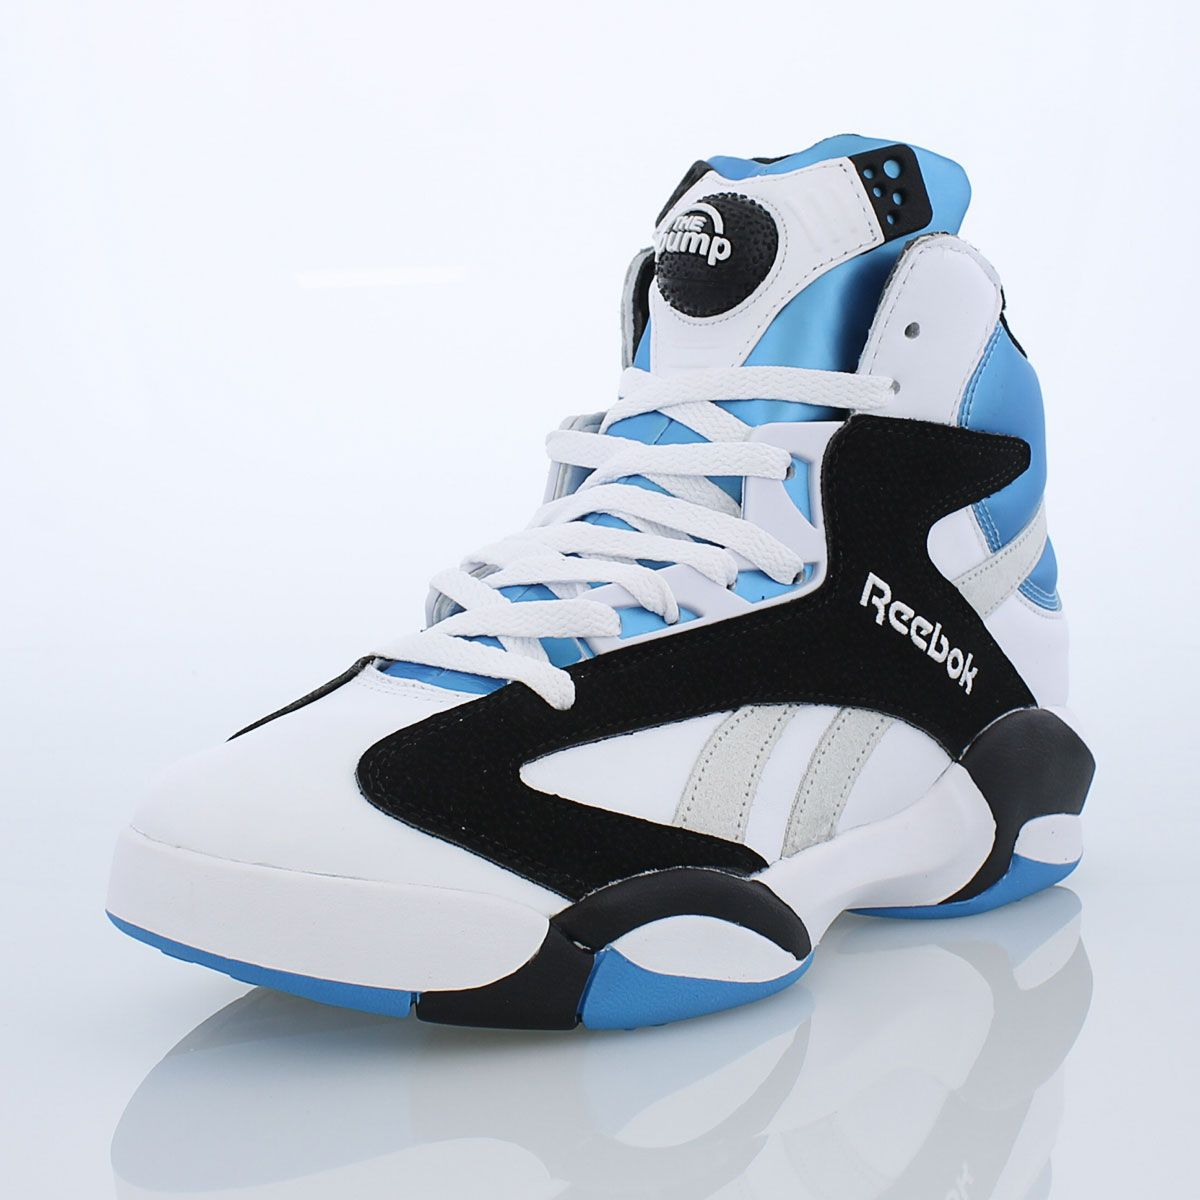 Reebok Shaq Attaq   Footwear  YCMC.com Heavy Rubber bafb6d315